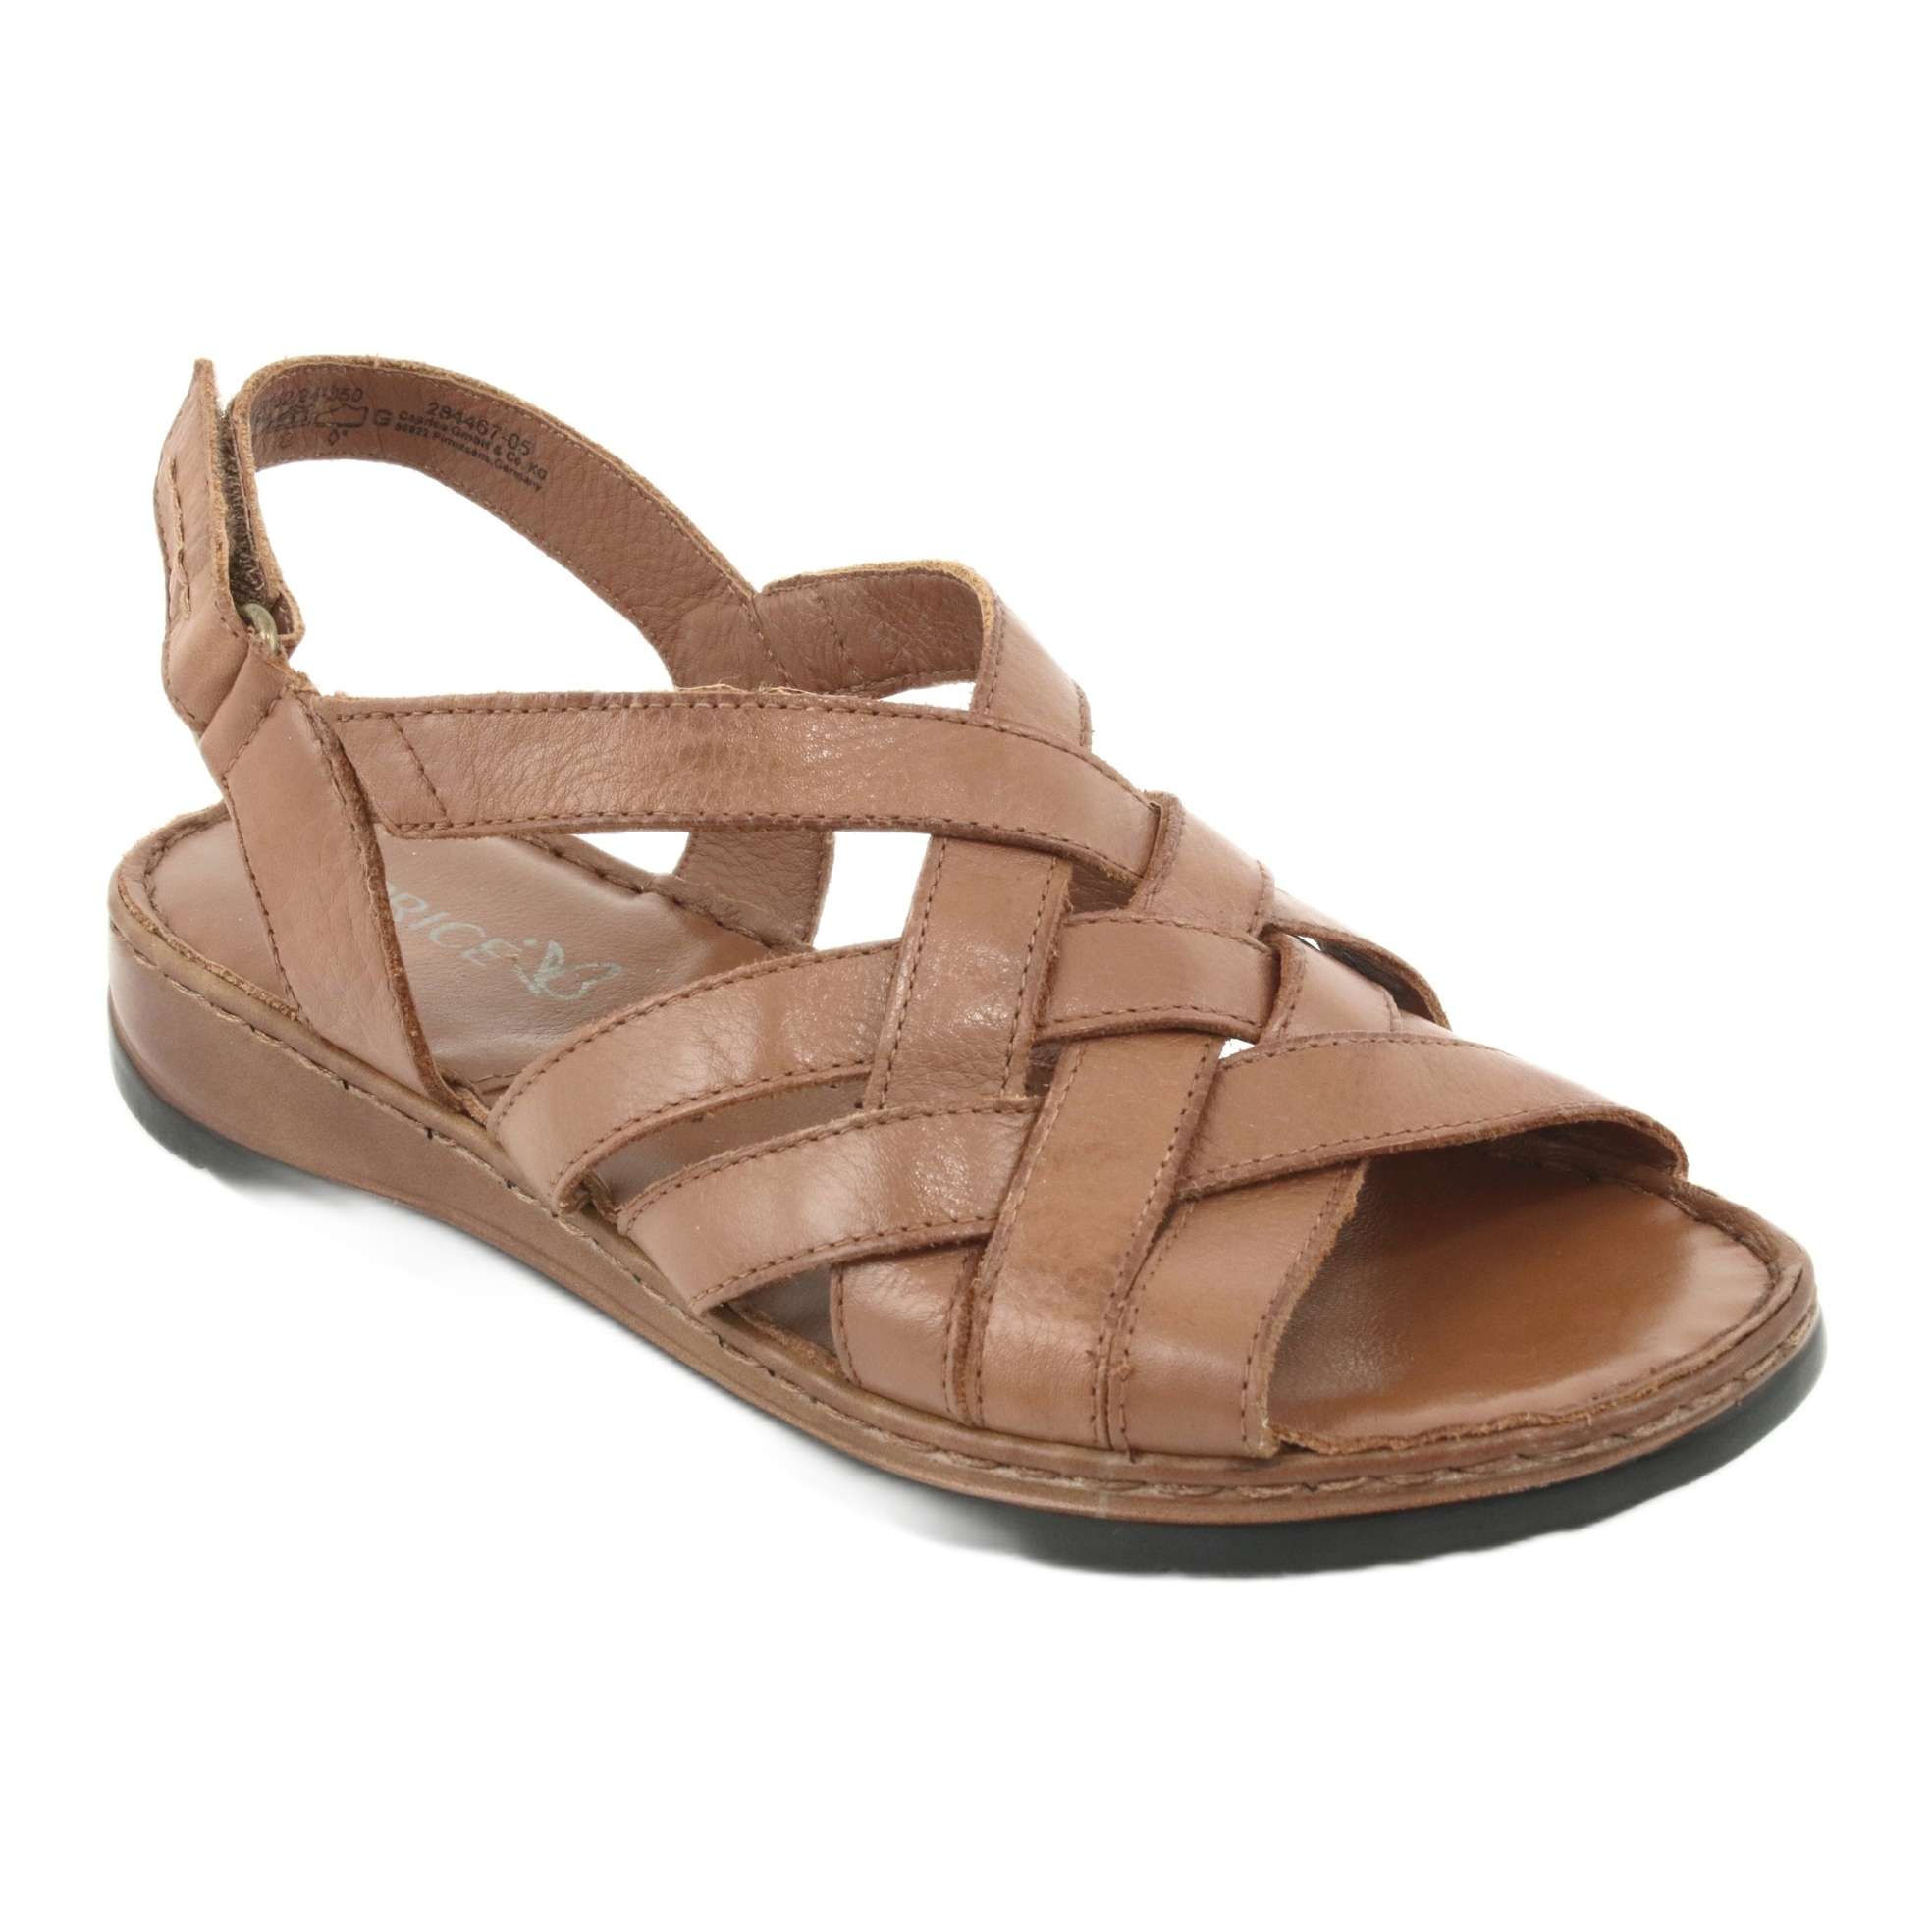 Caprice szandál női barna bőr cipő ButyModne.pl